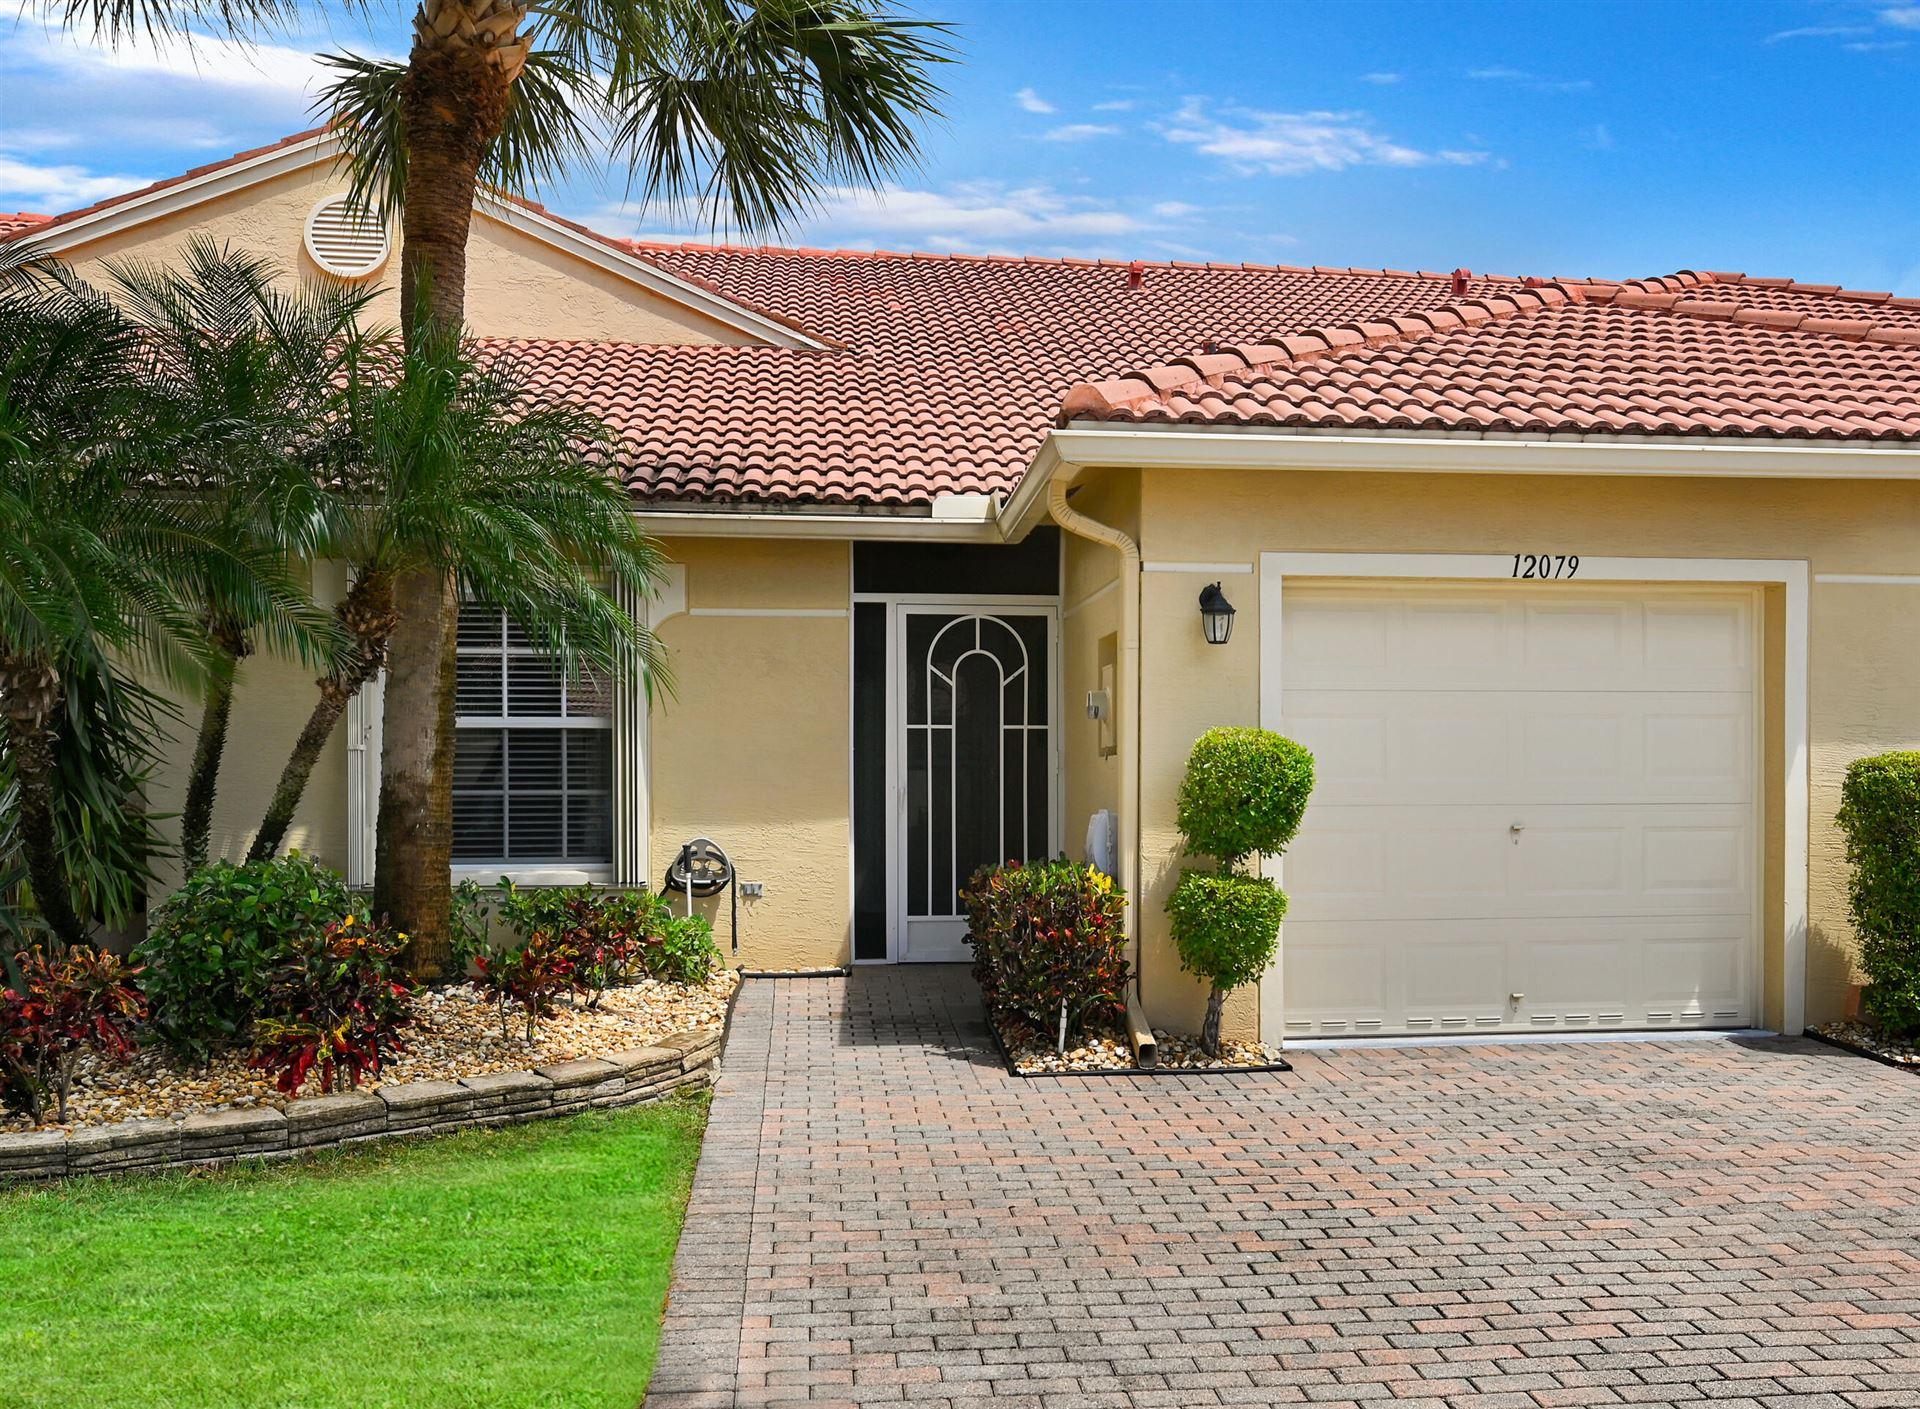 12079 Napoli Lane, Boynton Beach, FL 33437 - MLS#: RX-10723524